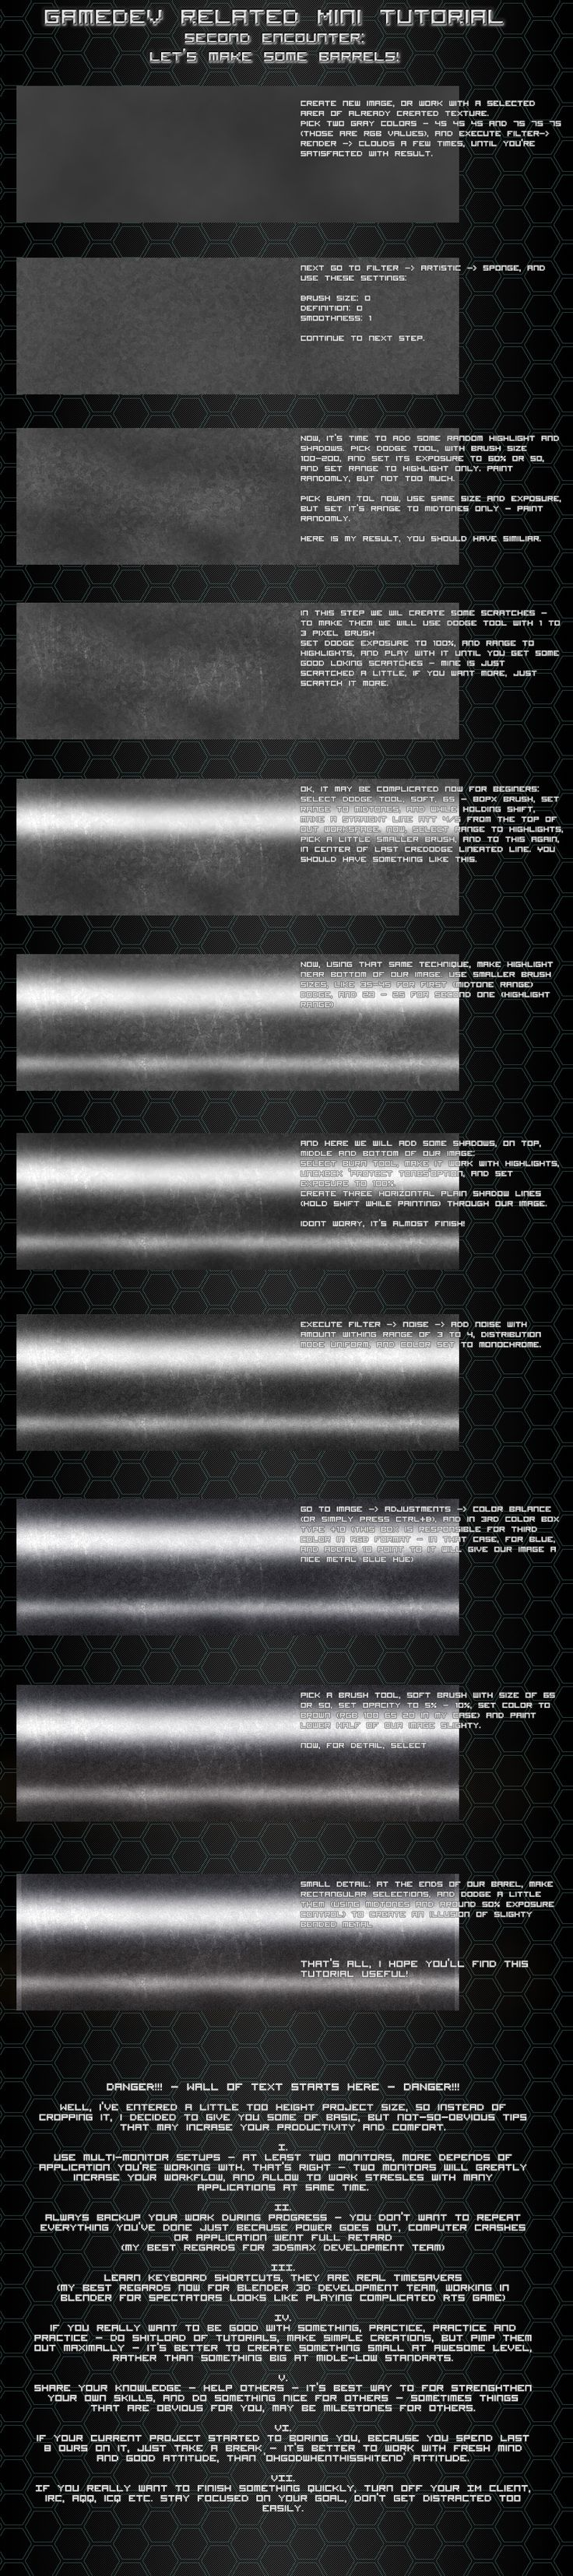 Metal barrel texture tutorial by Pirosan.deviantart.com on @deviantART